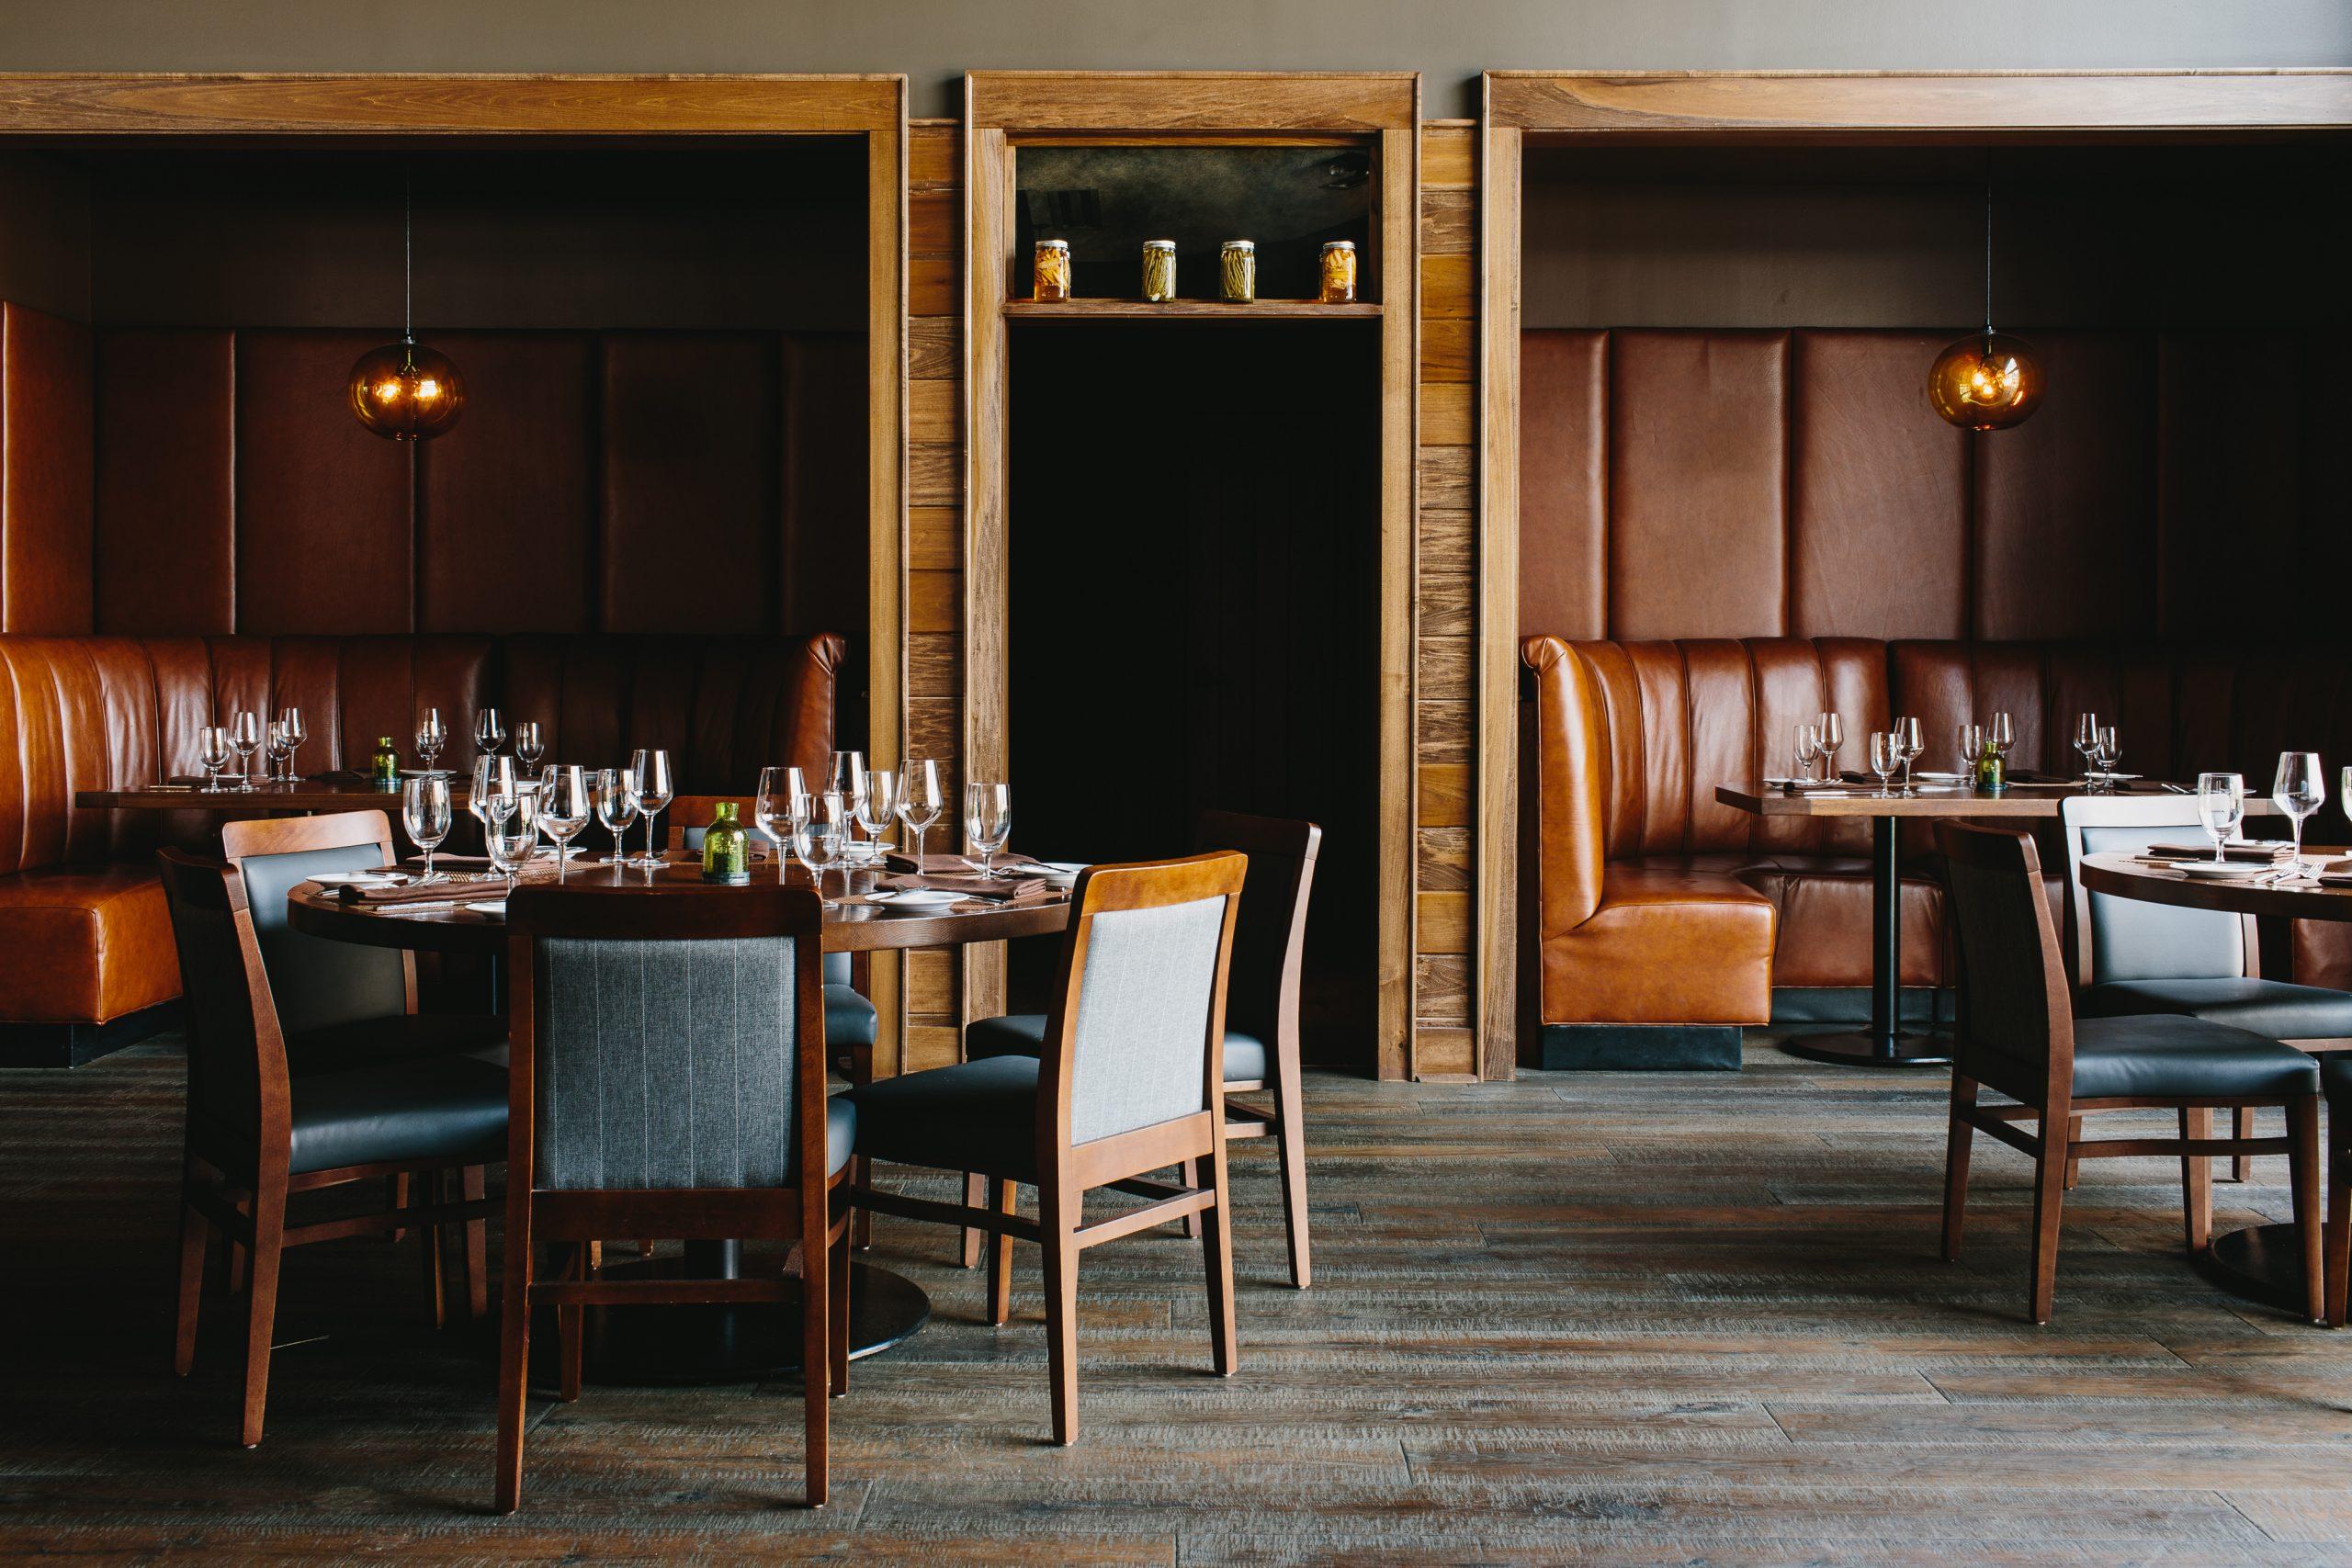 Restaurants | Bars & Lounges